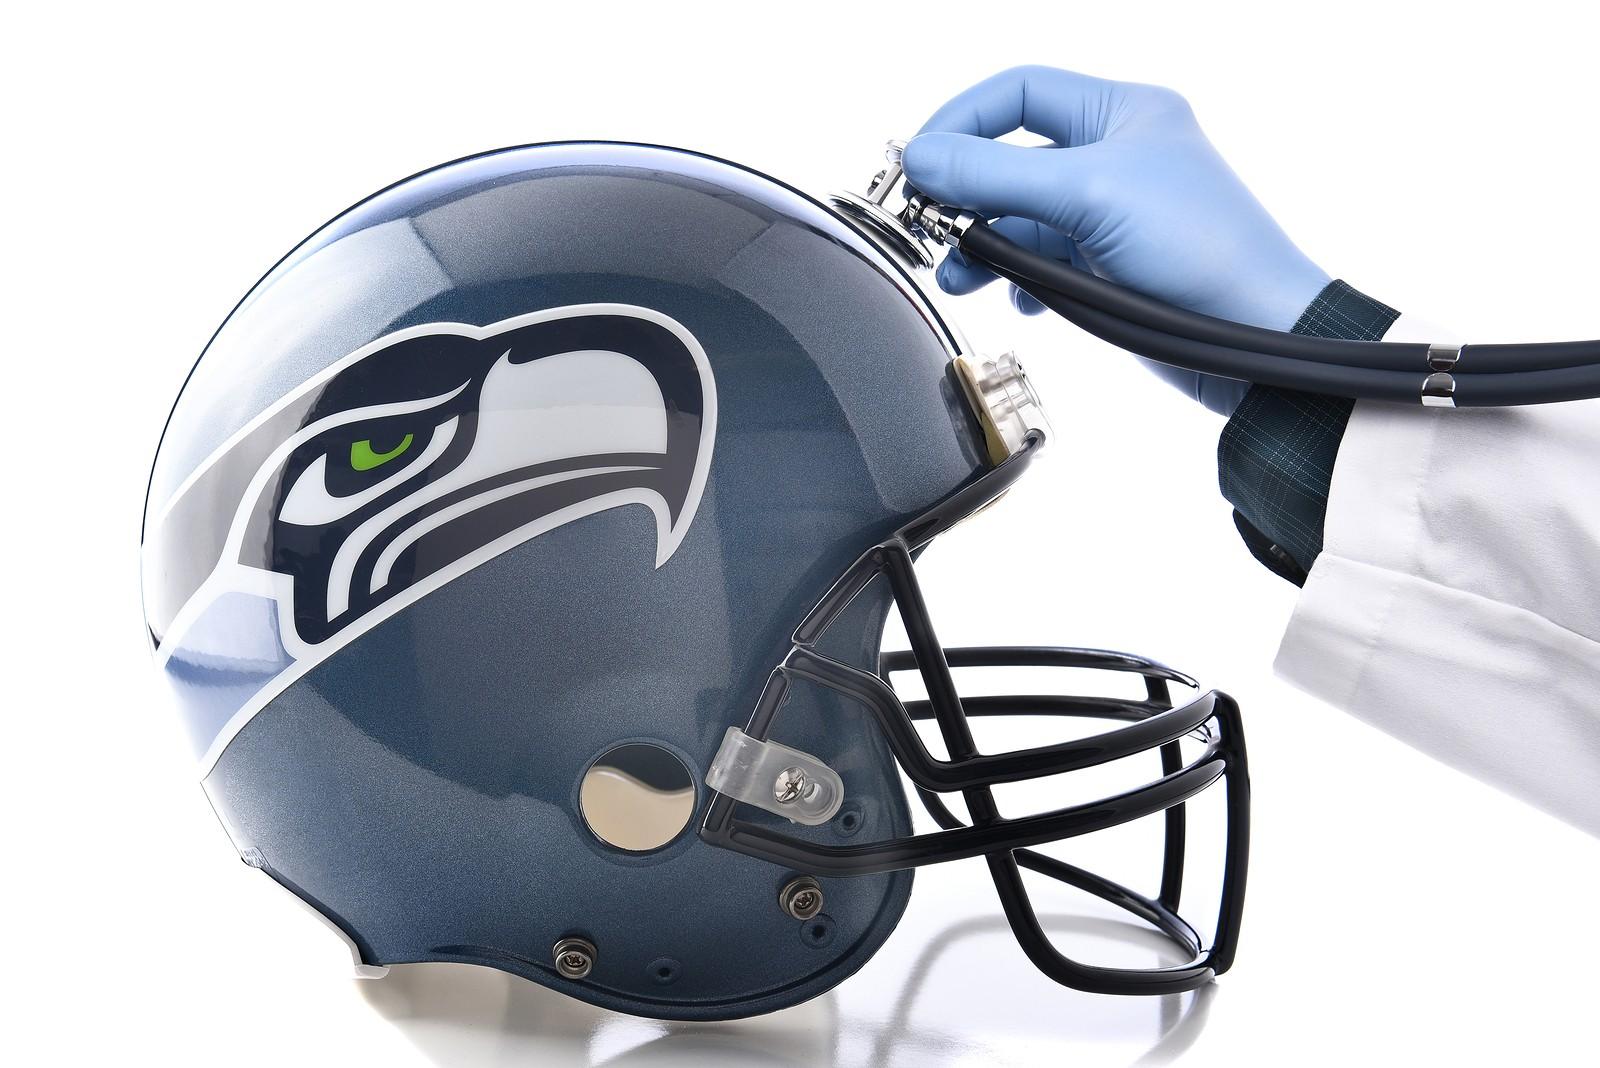 Seattle Seahawks Football Helmet w